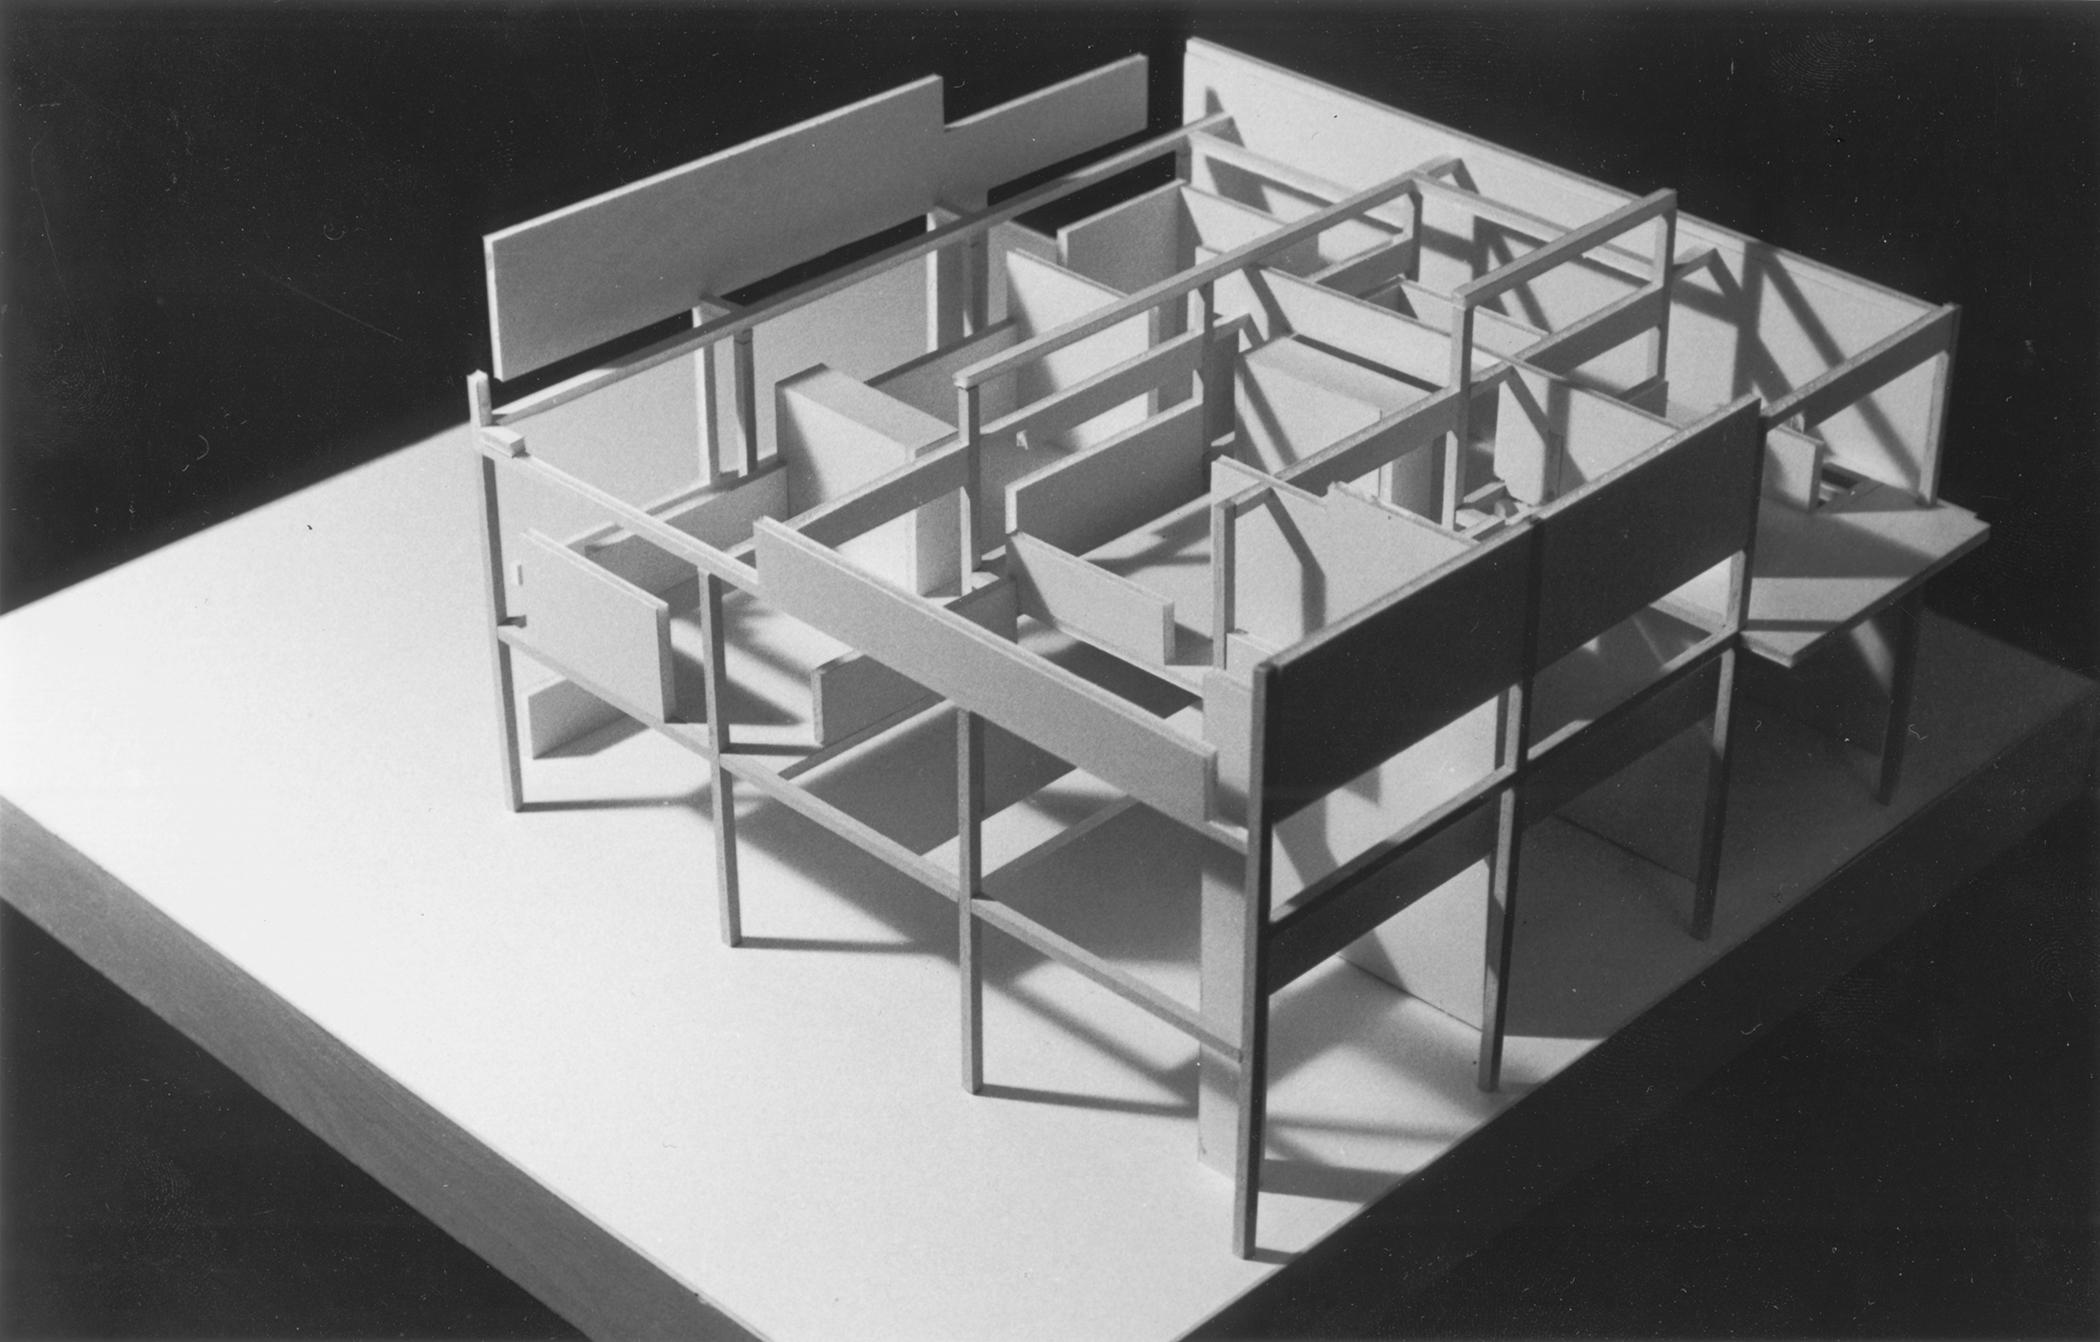 A model of House II